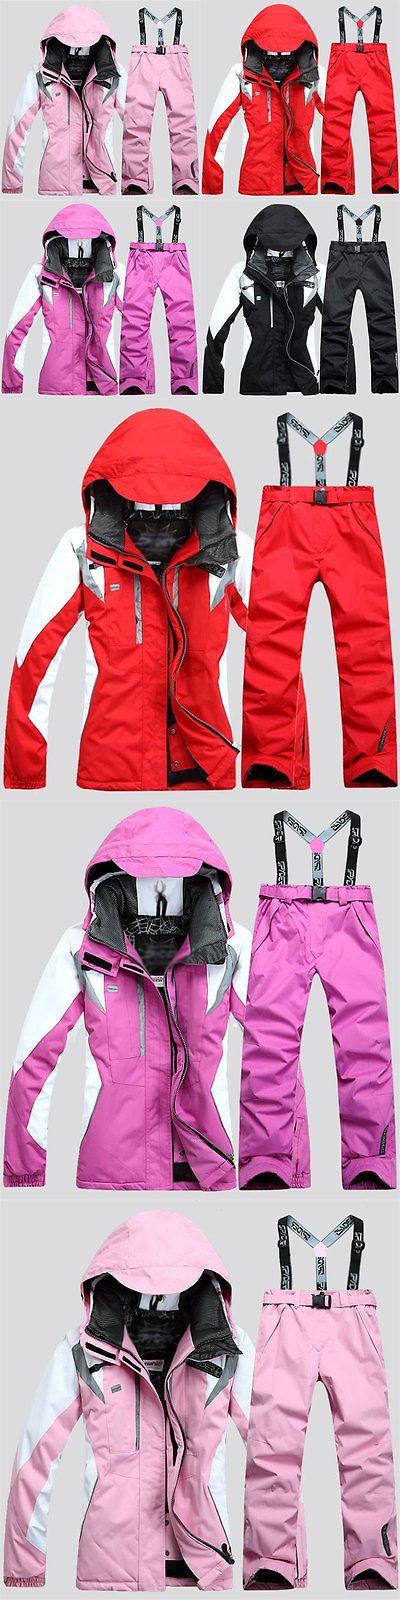 Snowsuits 62178: Women Hiking Ski Snow Suit Waterproof Snowboard Clothing Coat+Pants Warm Hot -> BUY IT NOW ONLY: $107.99 on eBay!